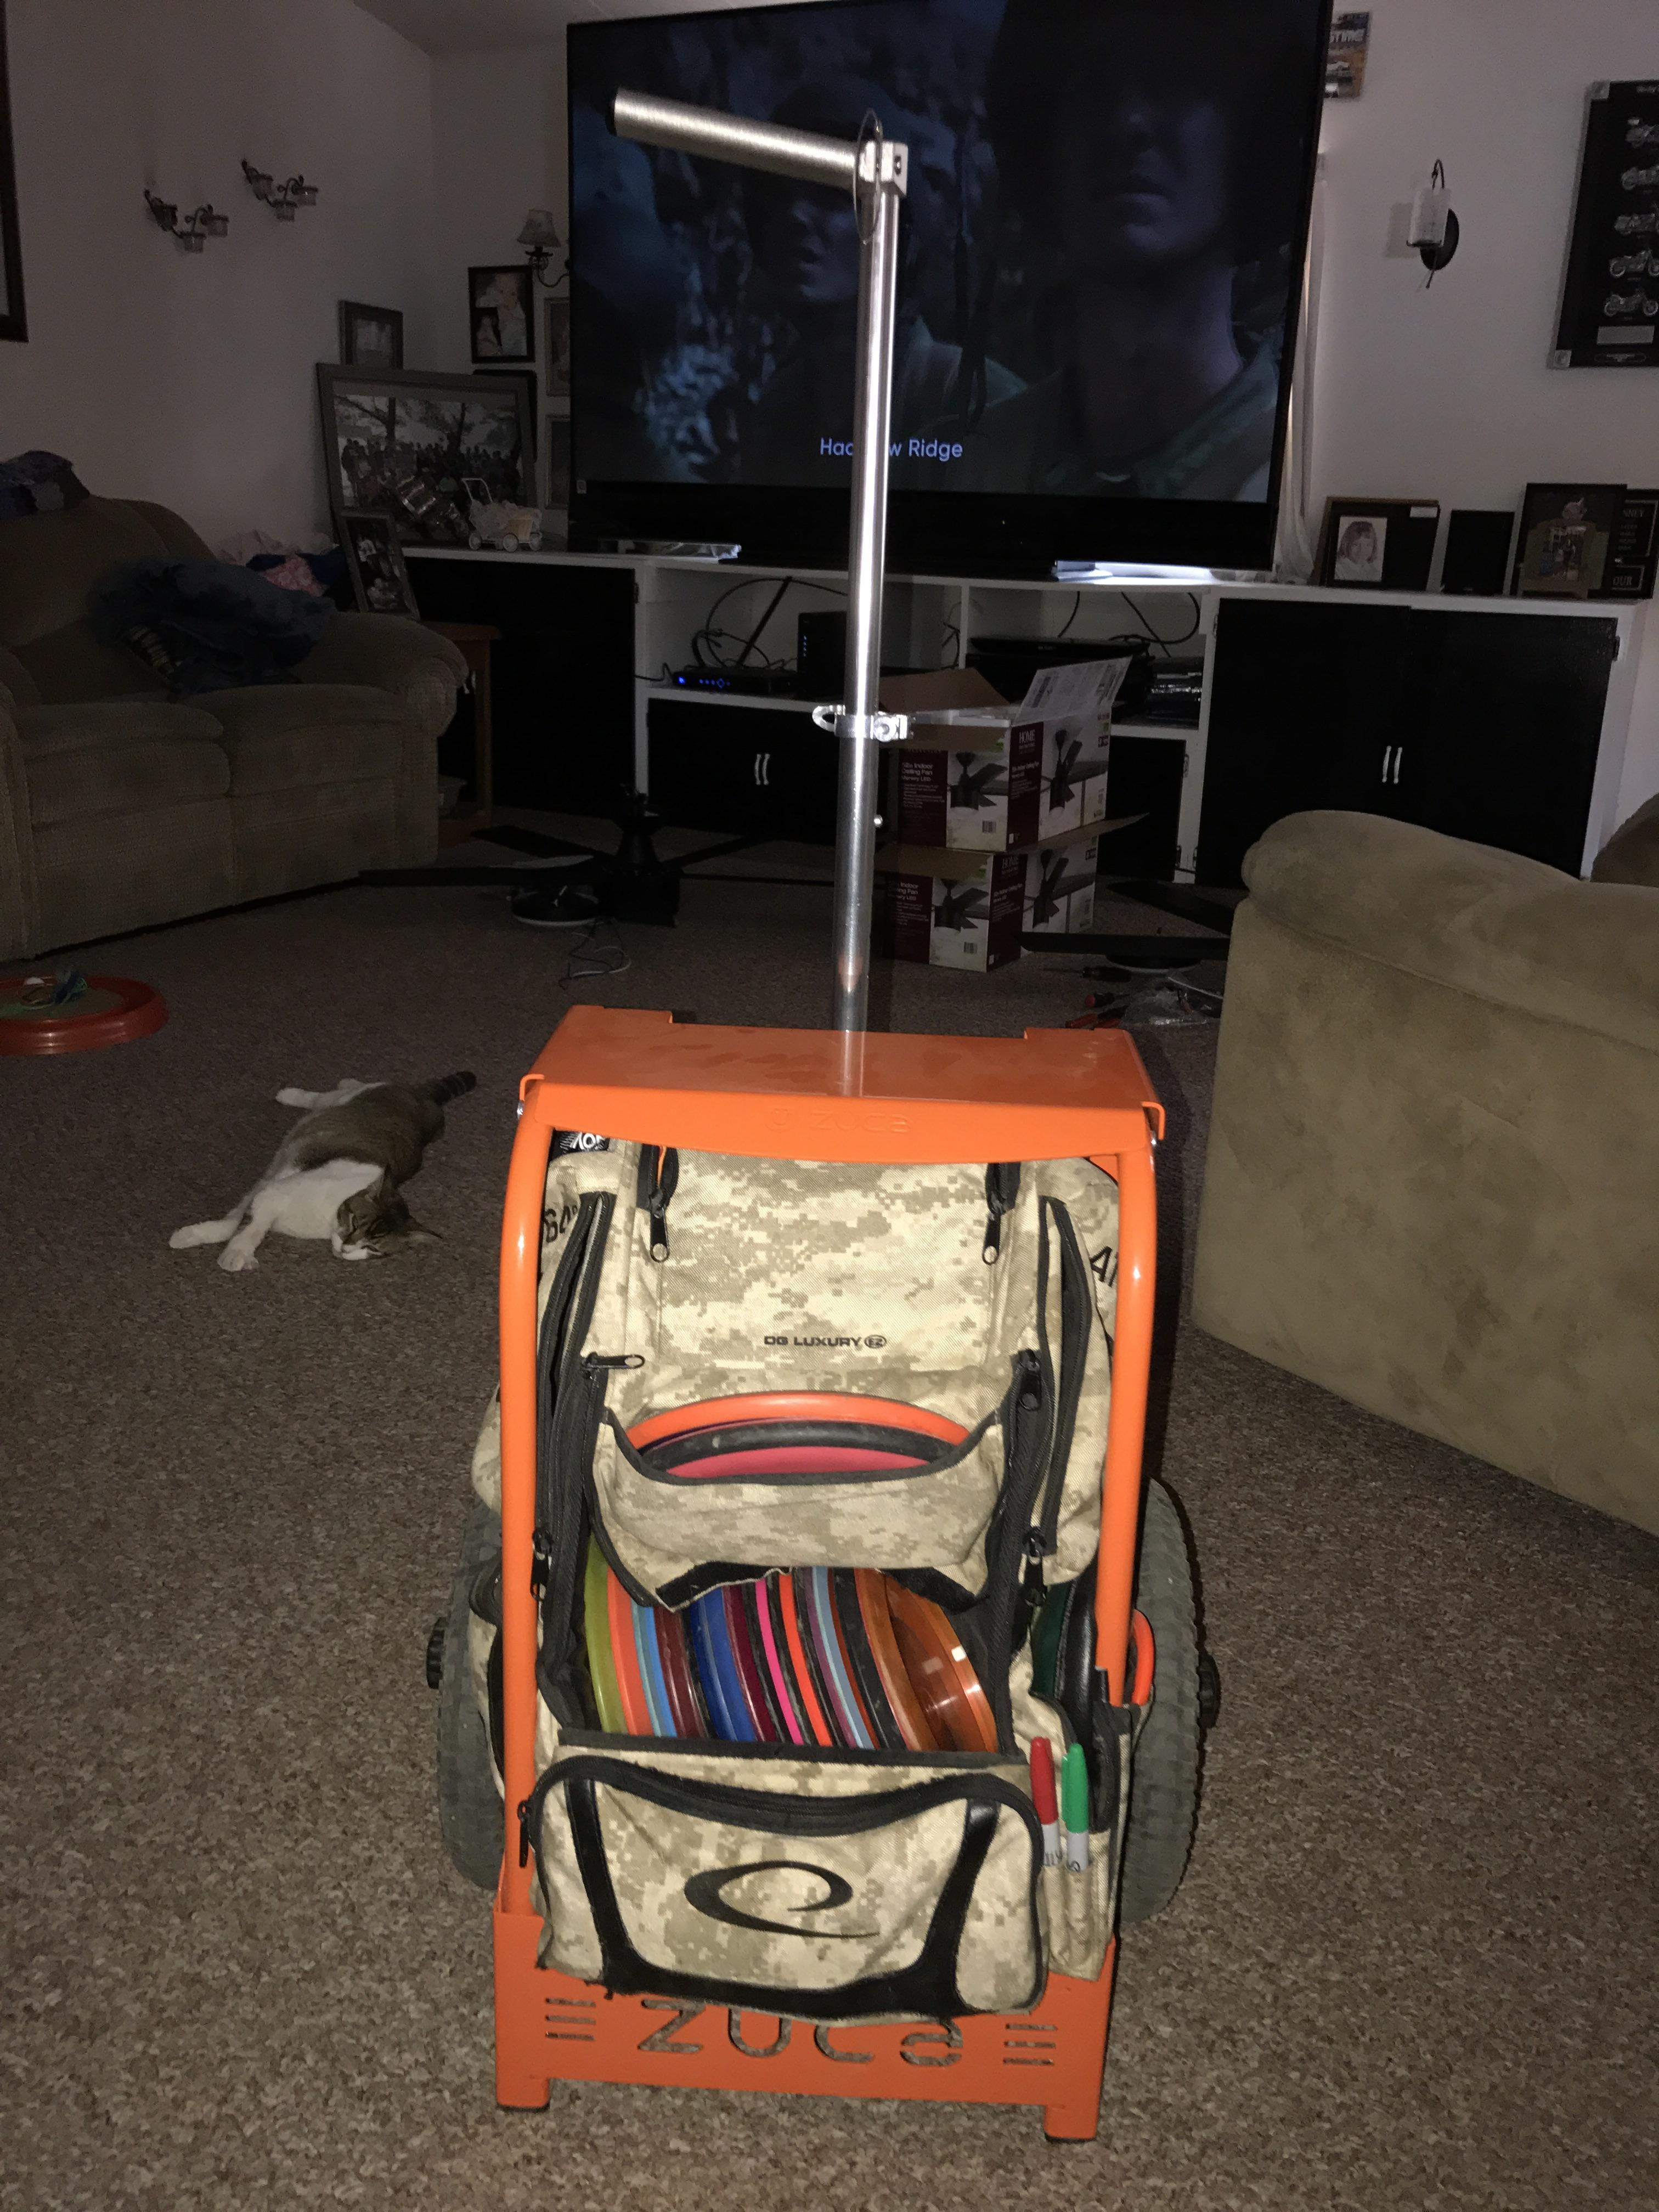 Best ideas about DIY Disc Golf Cart . Save or Pin Zuca cart newbie discgolf Now.